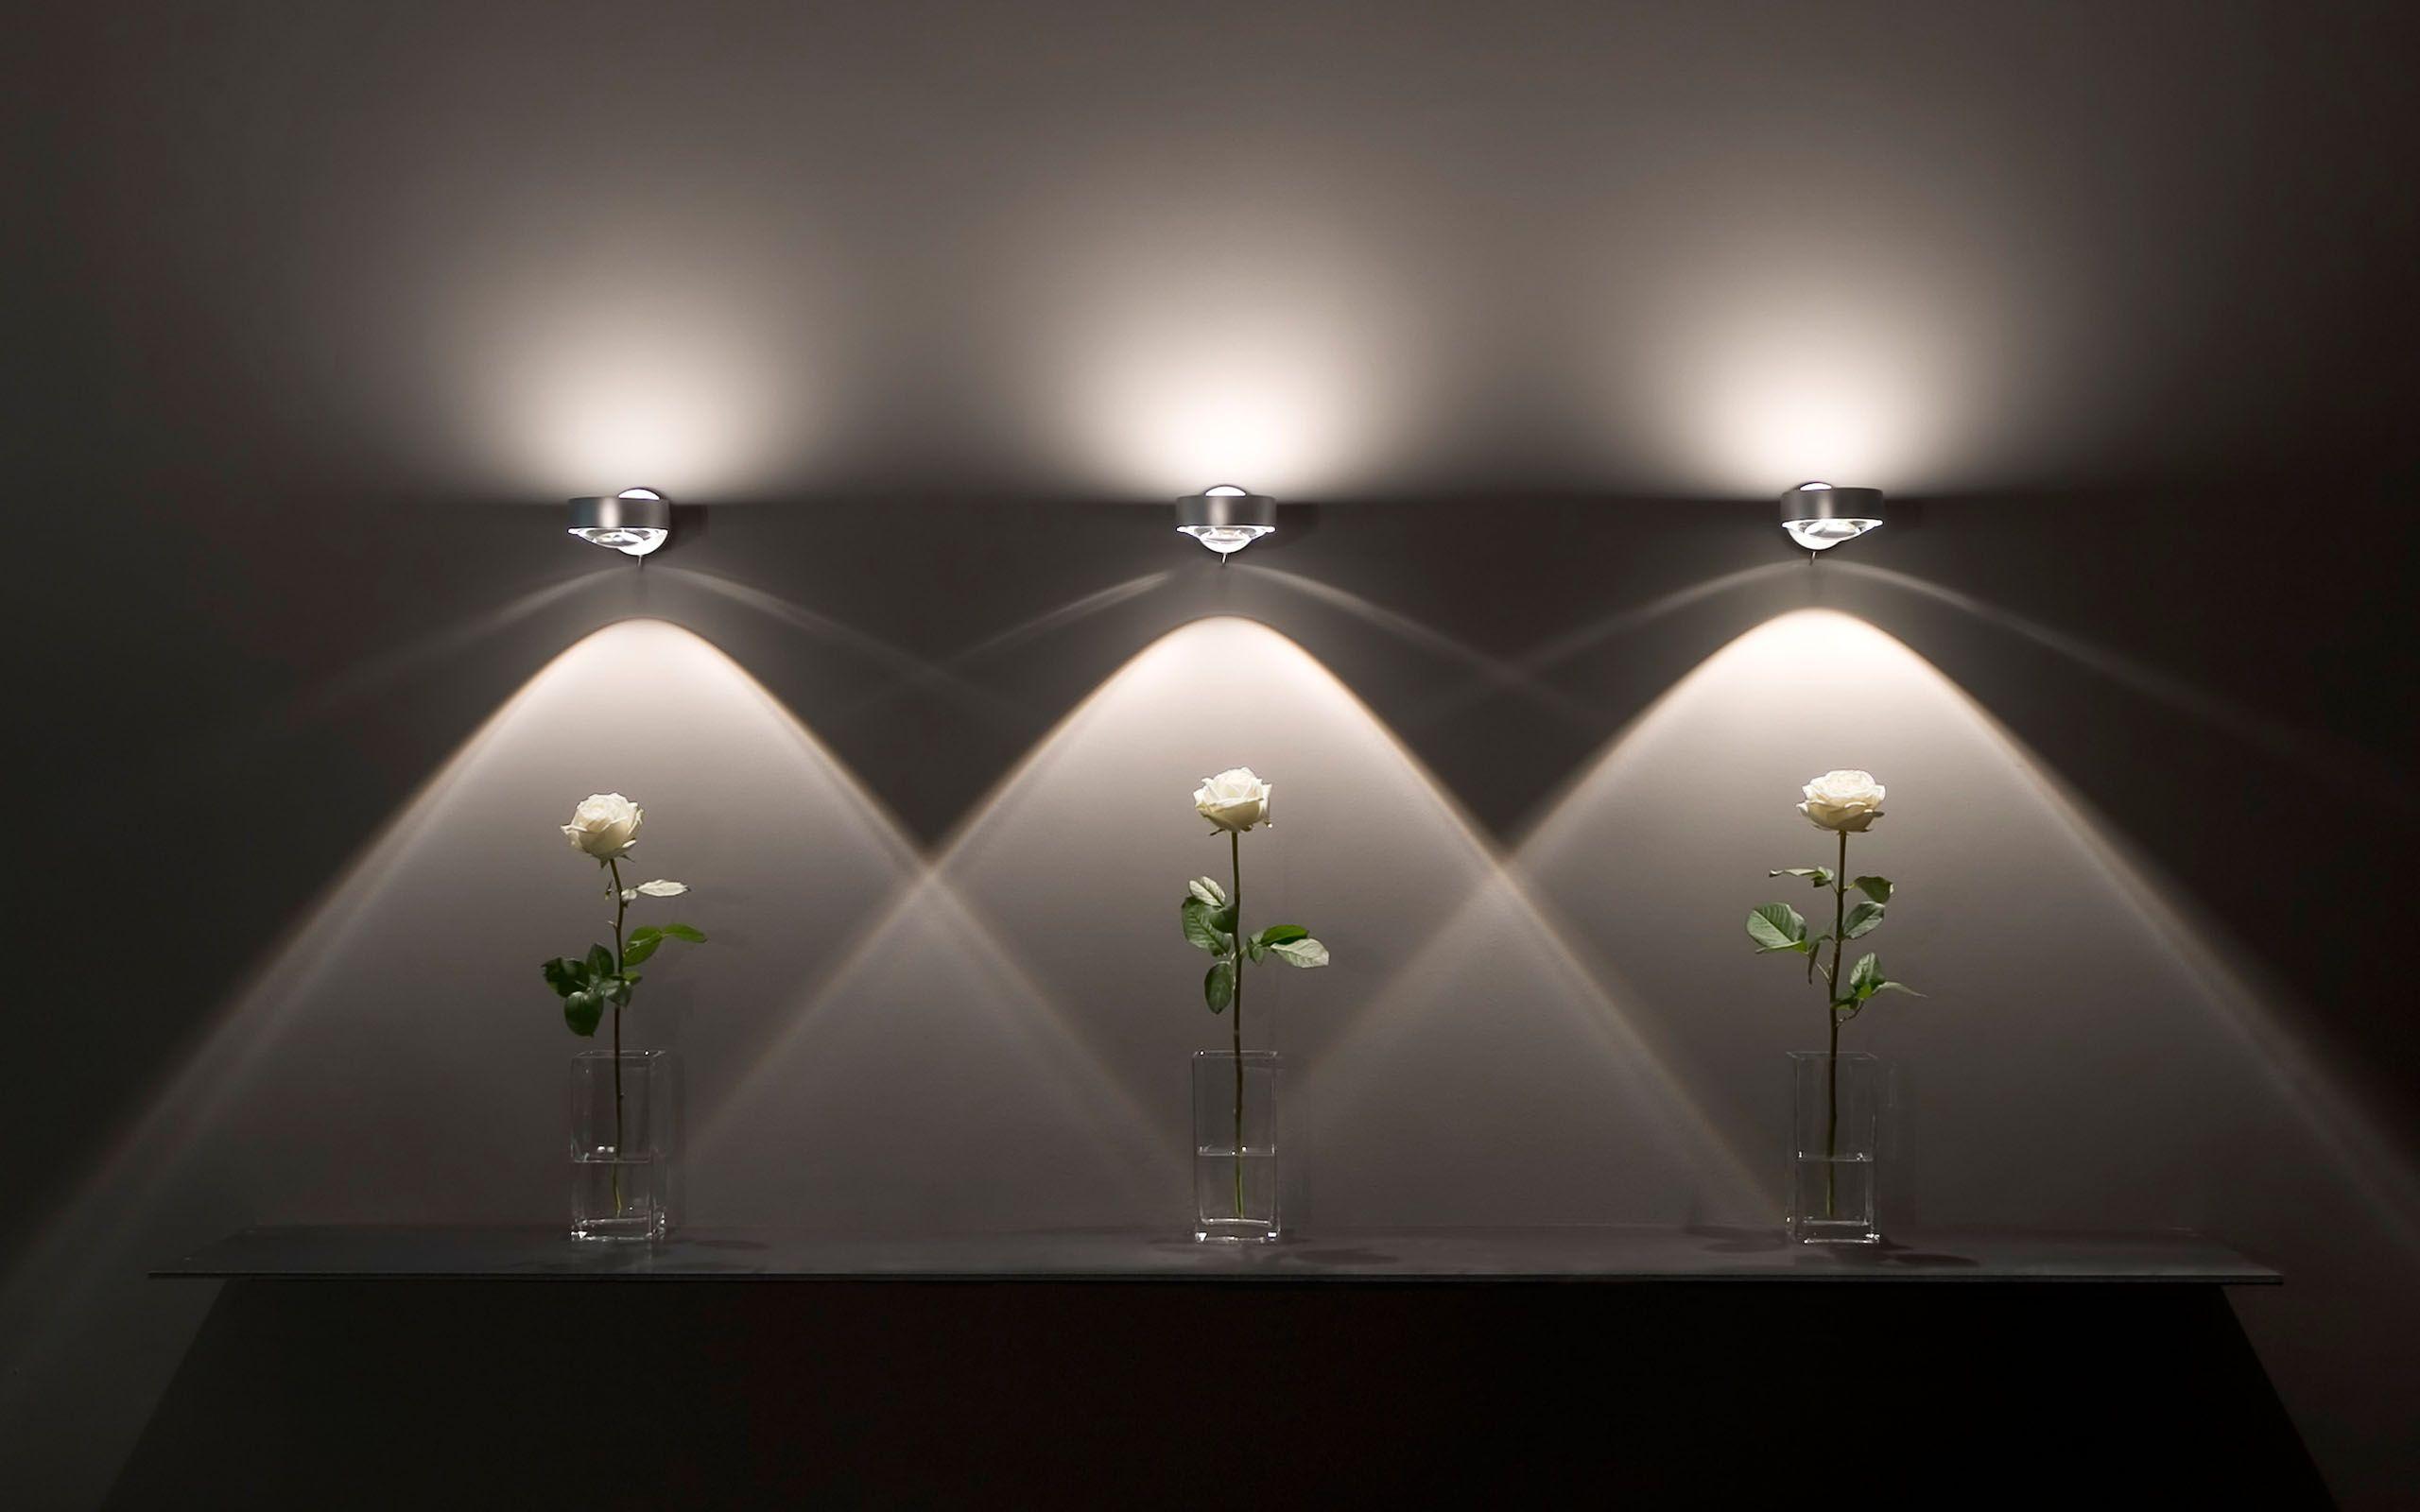 Occhio Sento Beach House Lighting Lighting Inspiration Wall Lighting Design